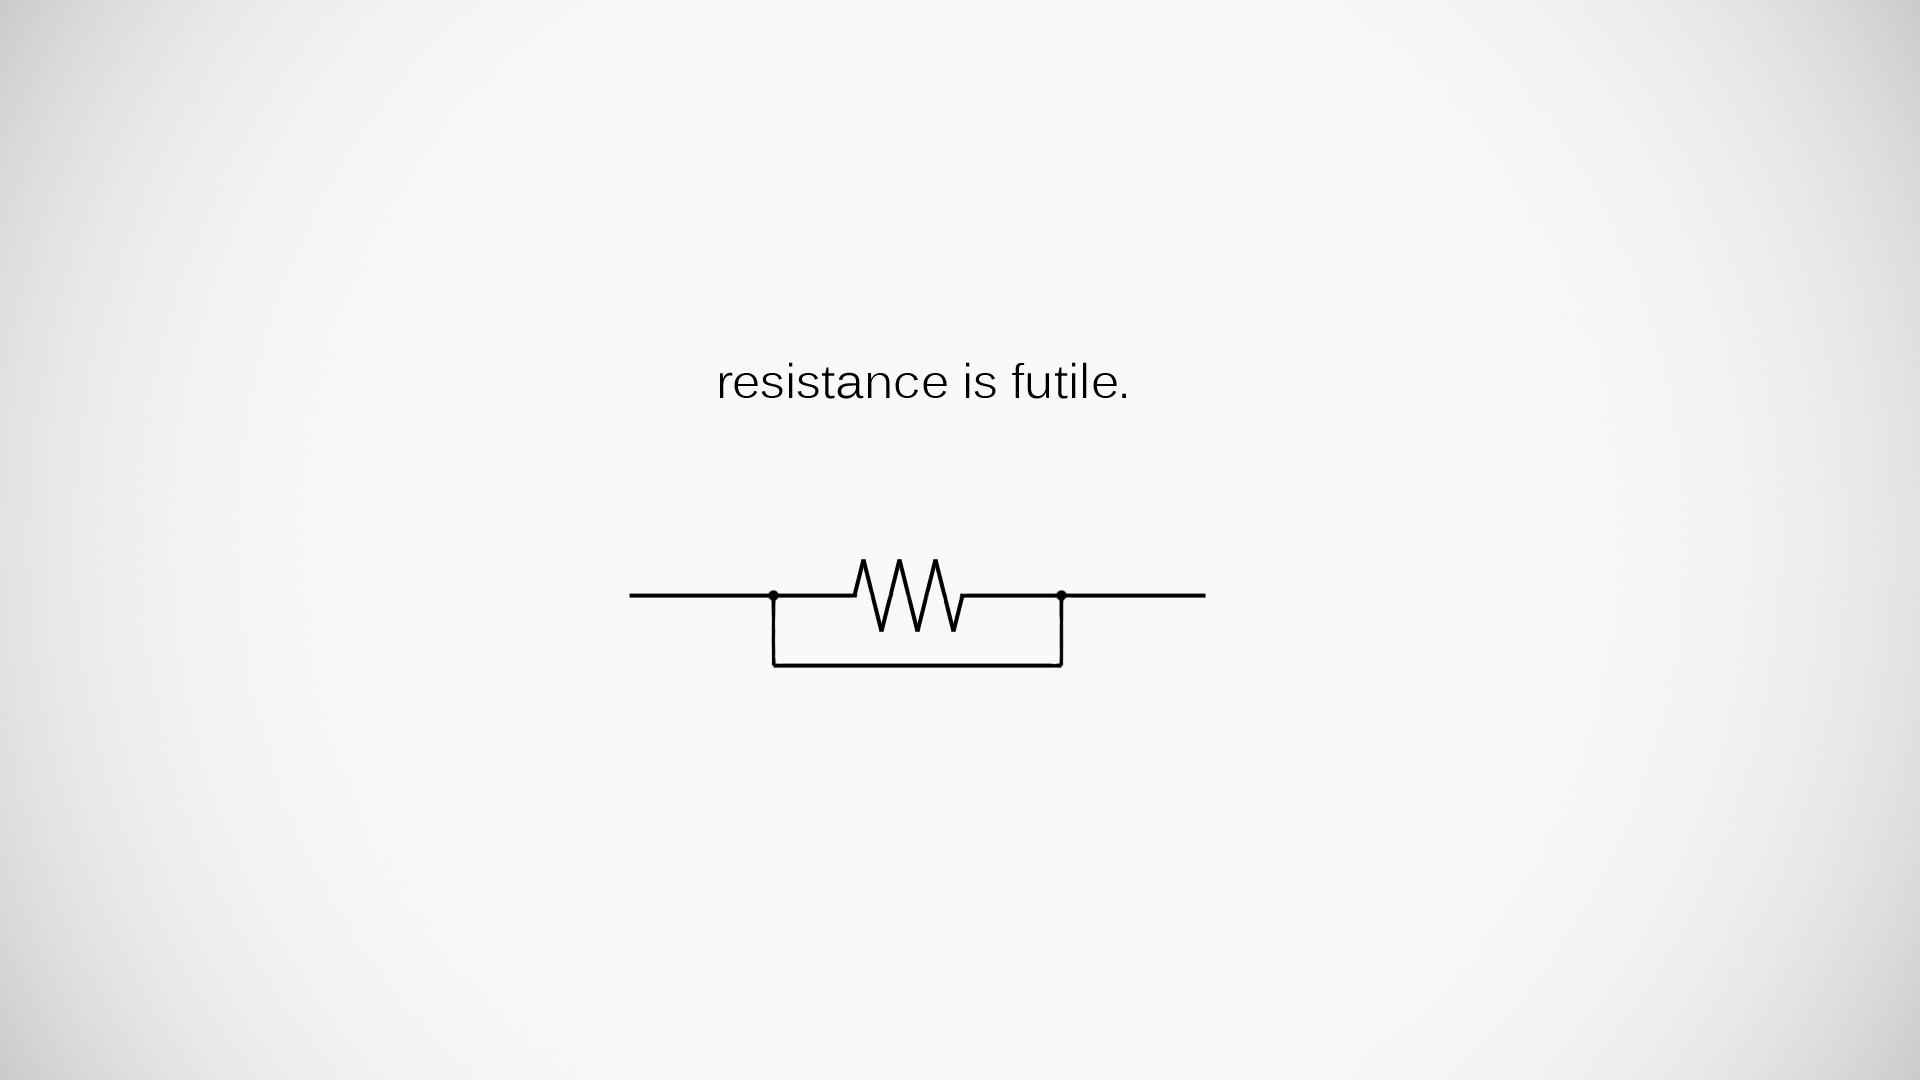 Wallpaper Quote Minimalism Humor Text Logo Circle Brand Circuit Diagram Circuits Electronics Shape Line Presentation Font Product Document